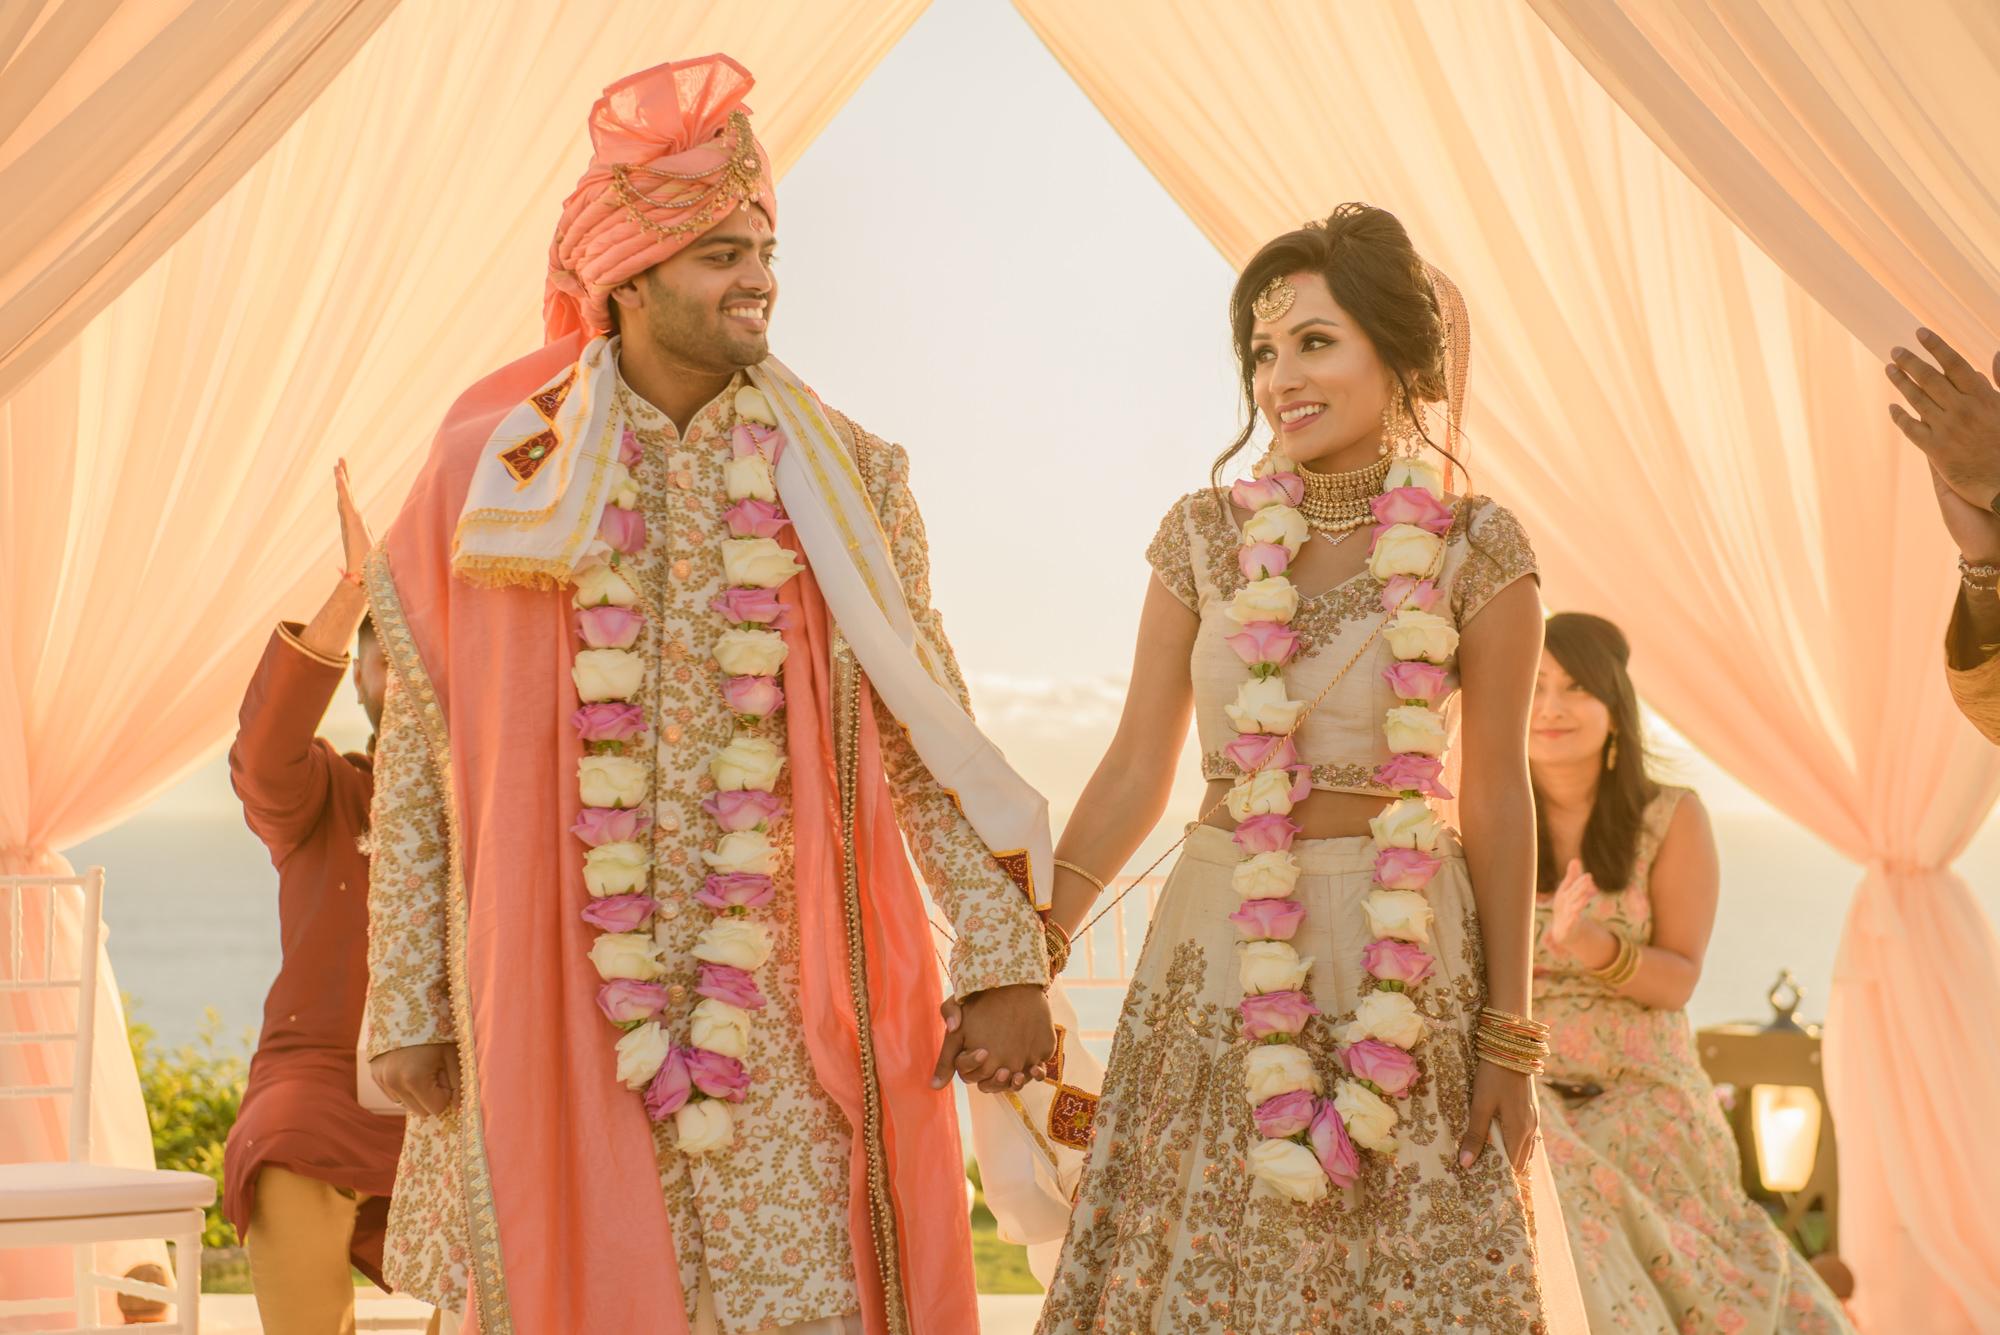 satnam photography wedding indian asian hindu destination wedding photographer tenerife ritz carlton abama-222.jpg